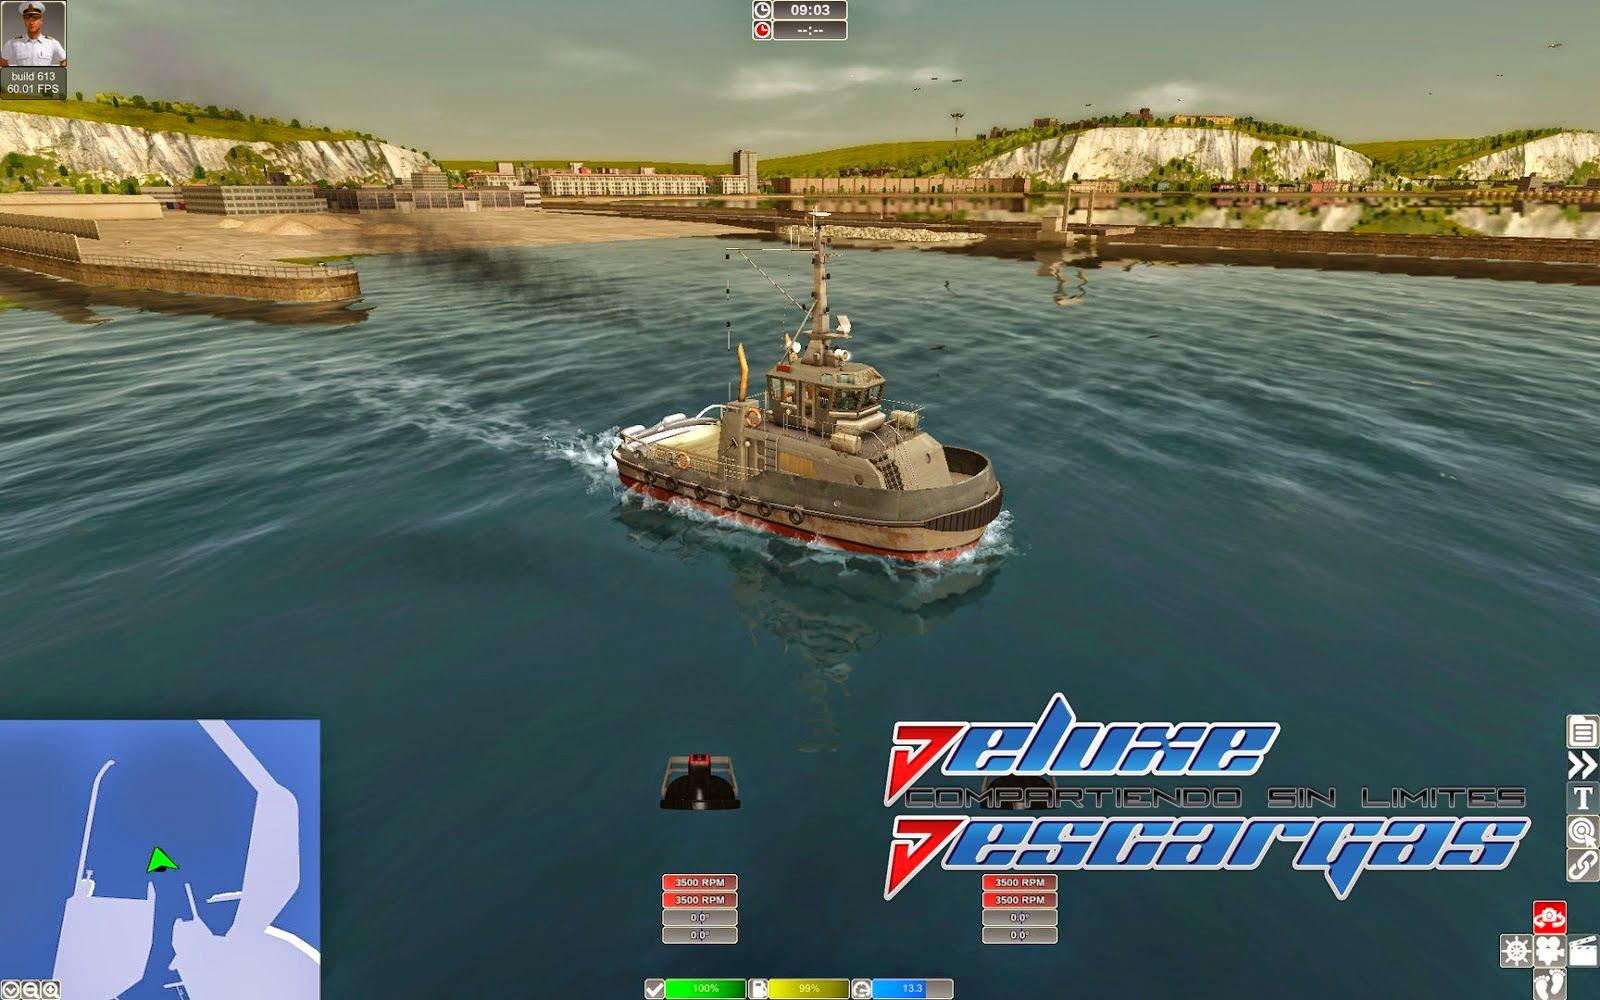 European_Ship_Simulator-www.deluxedescargas.com%2B(5).jpg